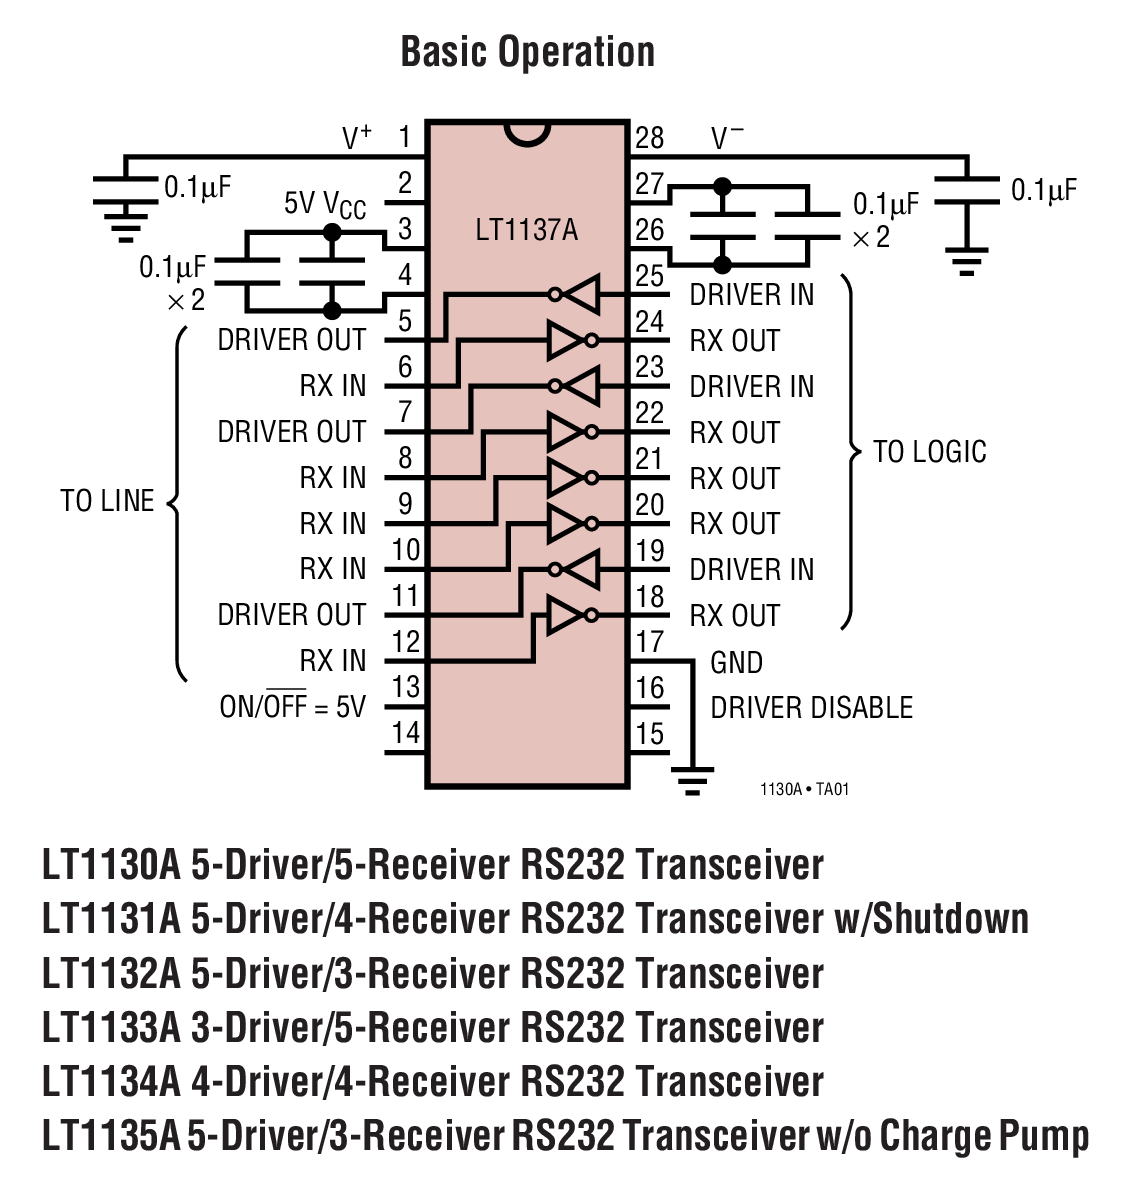 LT1138A 采用小電容器的先進低功率 5V RS232 驅動器 / 接收器